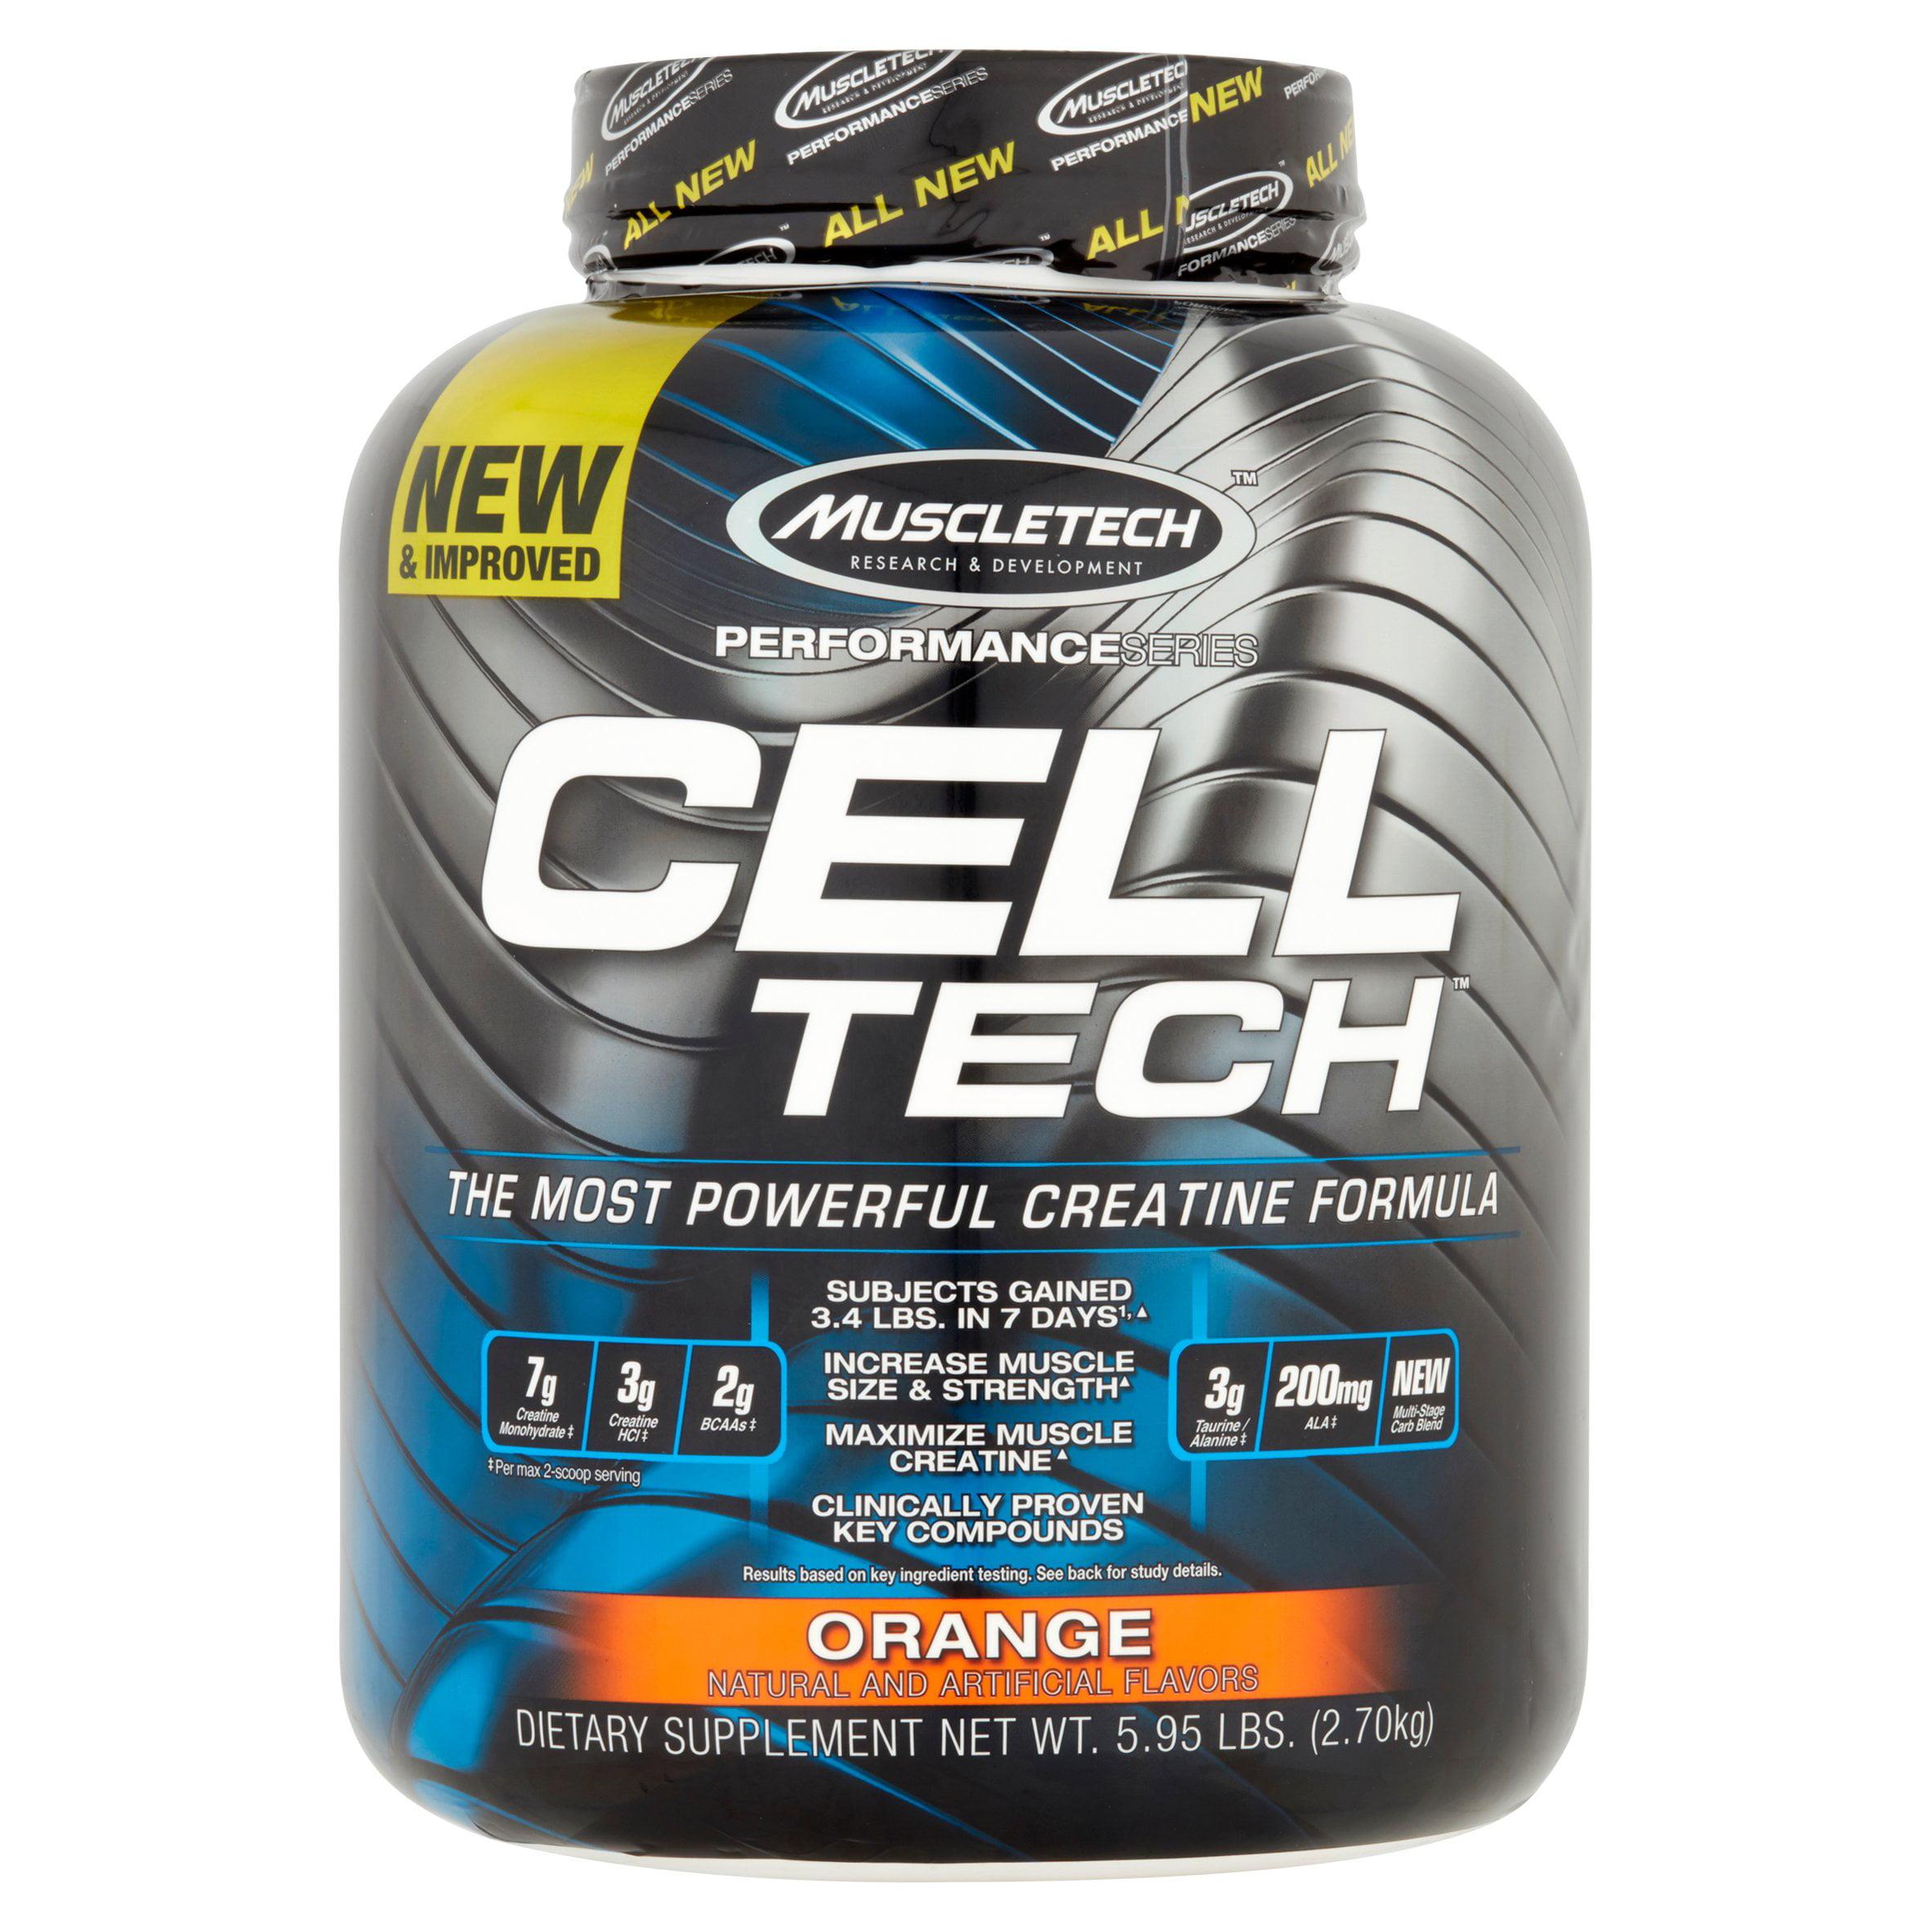 MuscleTech Cell Tech Hardgainer Creatine Powder, Orange, 55 Servings